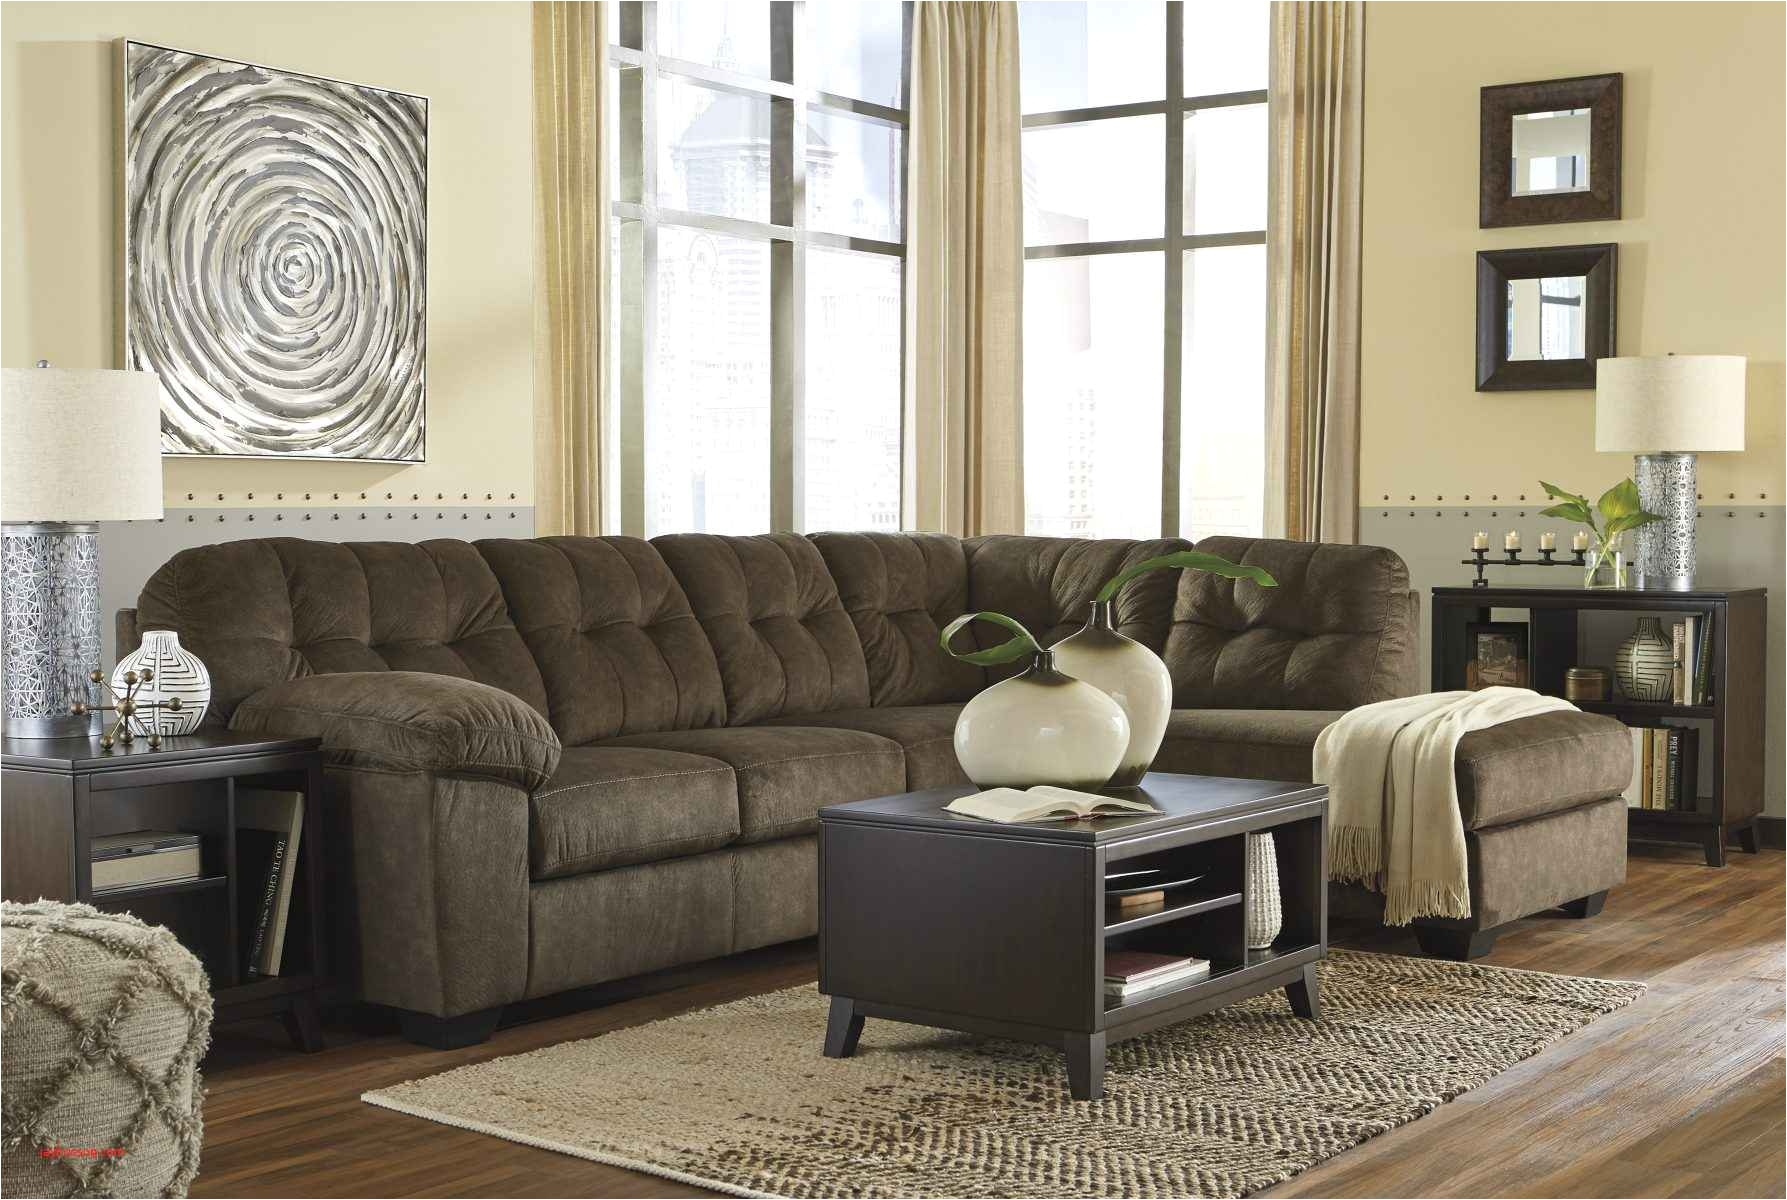 Ashley Furniture Tyler Tx Furniture Store In Boardman Ohio Fresh Best Furniture Mentor Oh